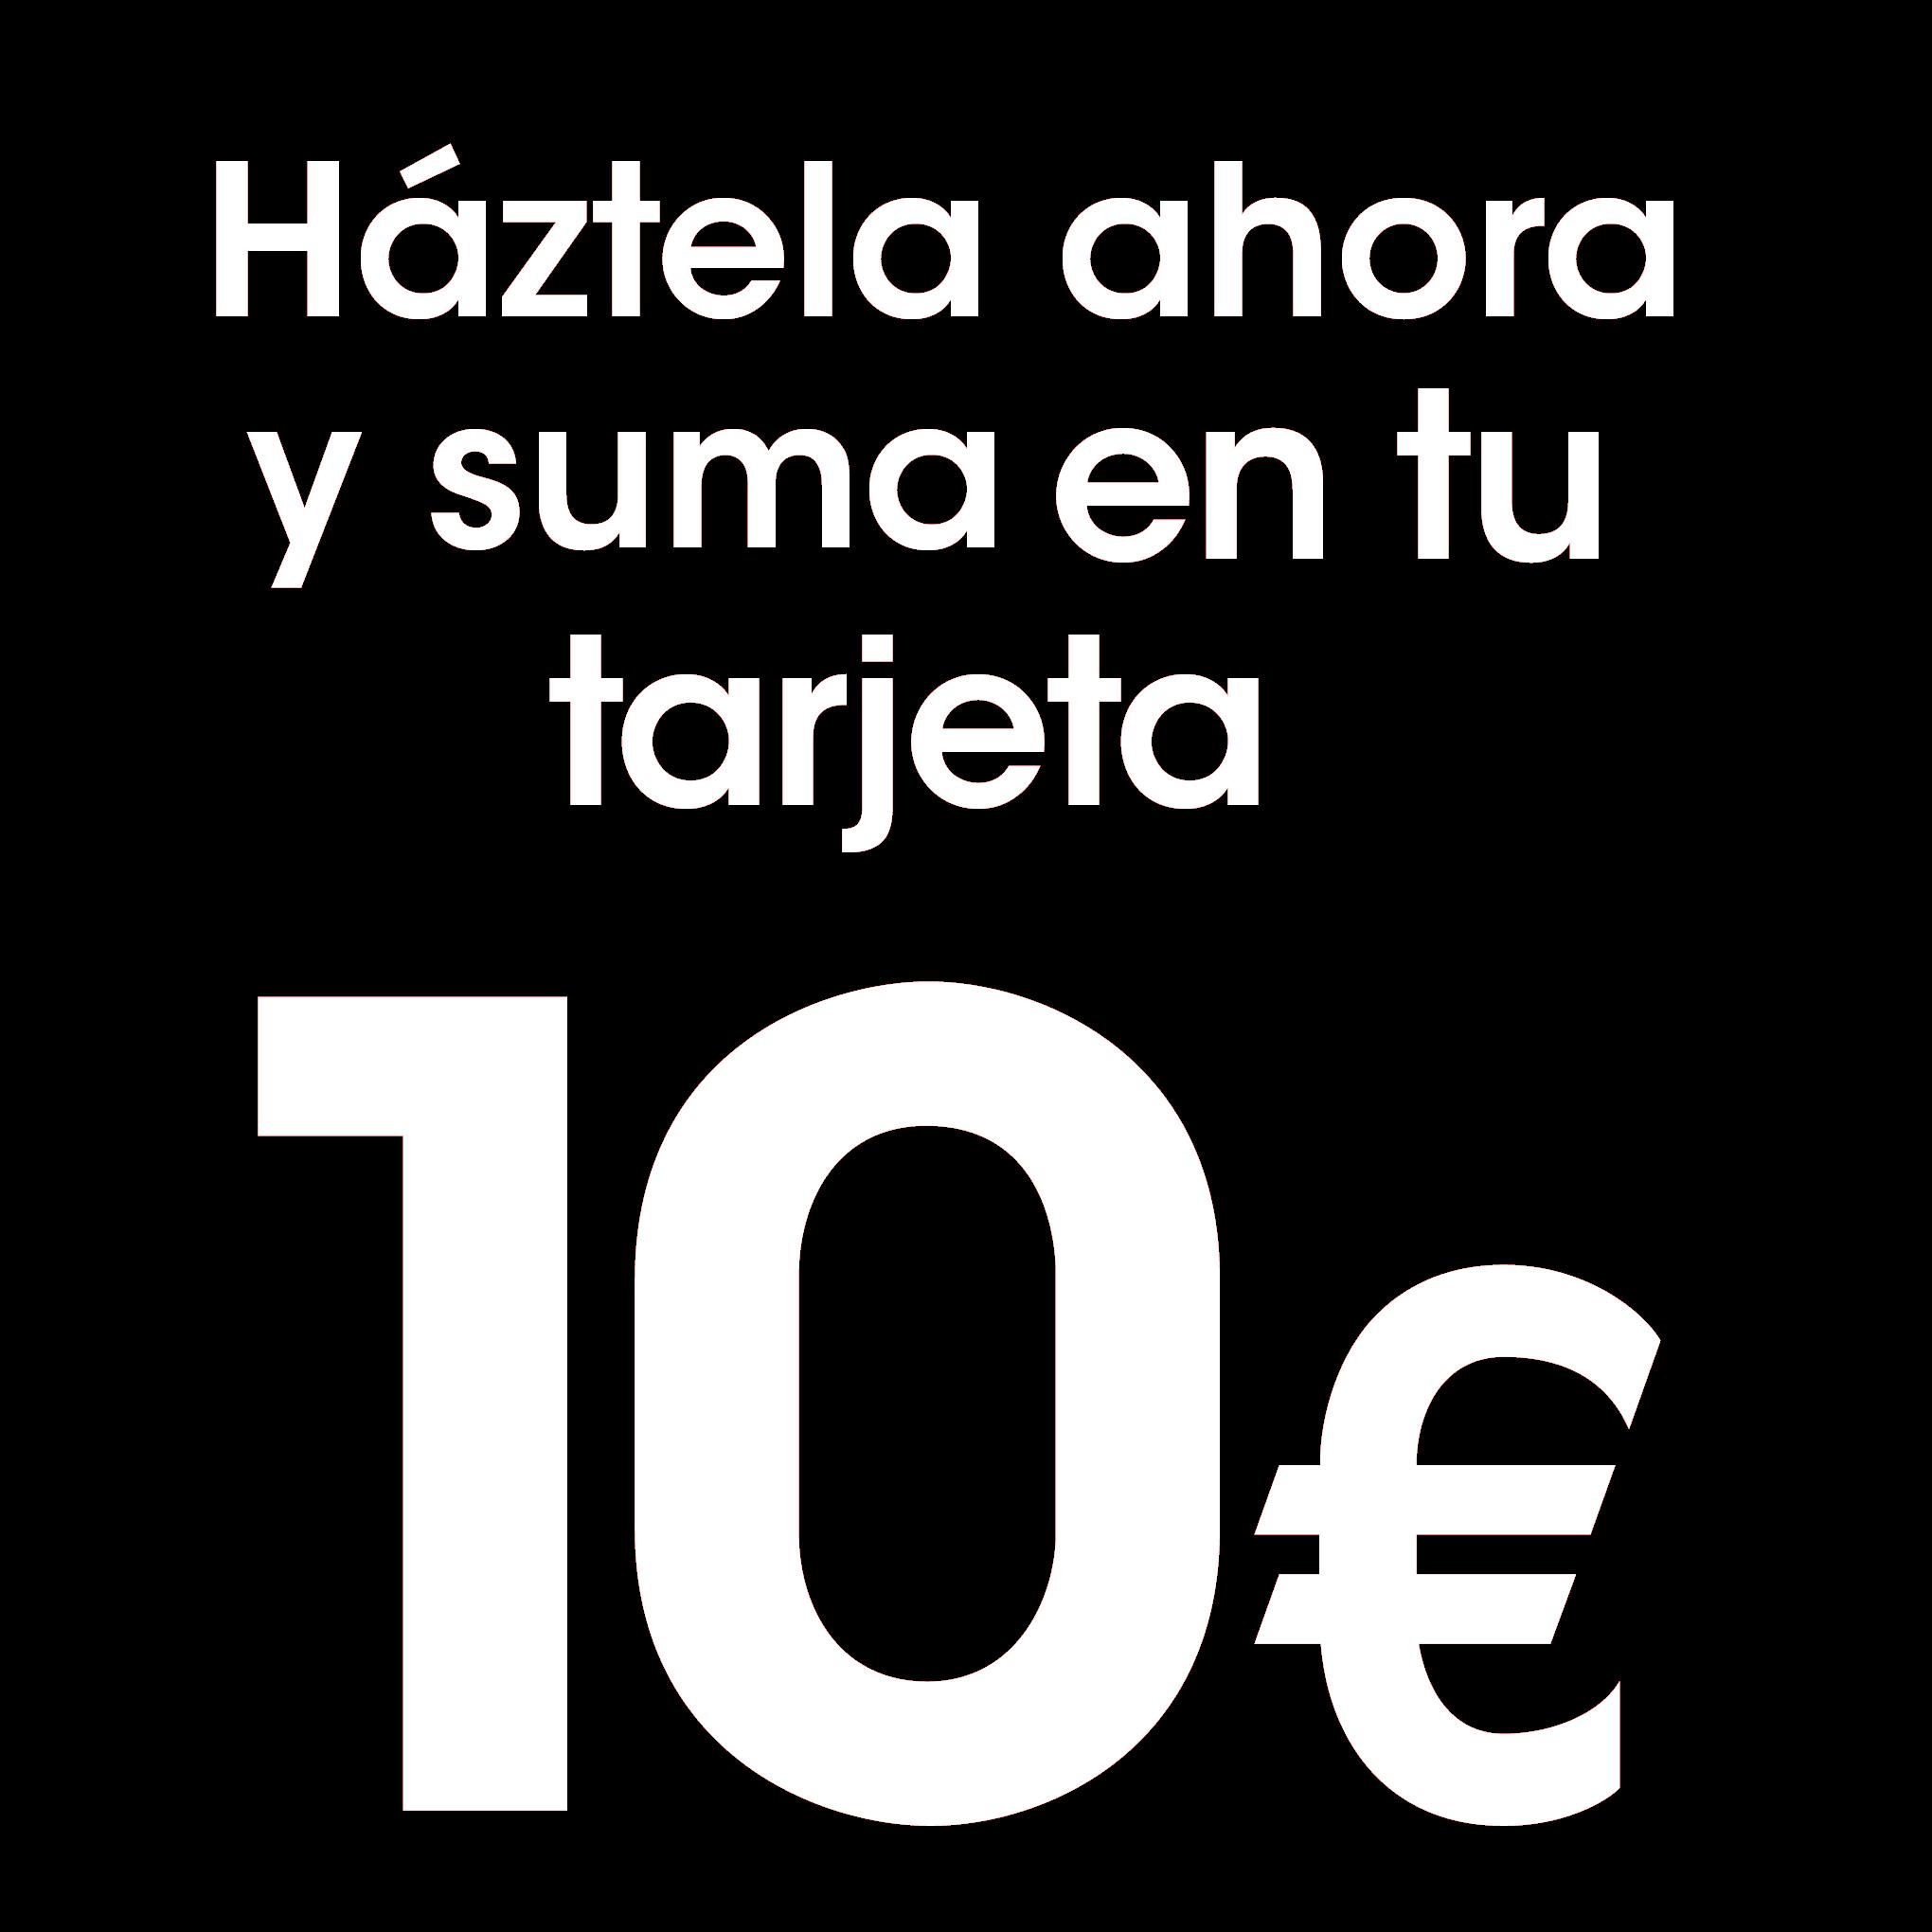 Hazte ahora tu tarjeta EROSKI club Mastercard y suma en tu tarjeta 10 euros